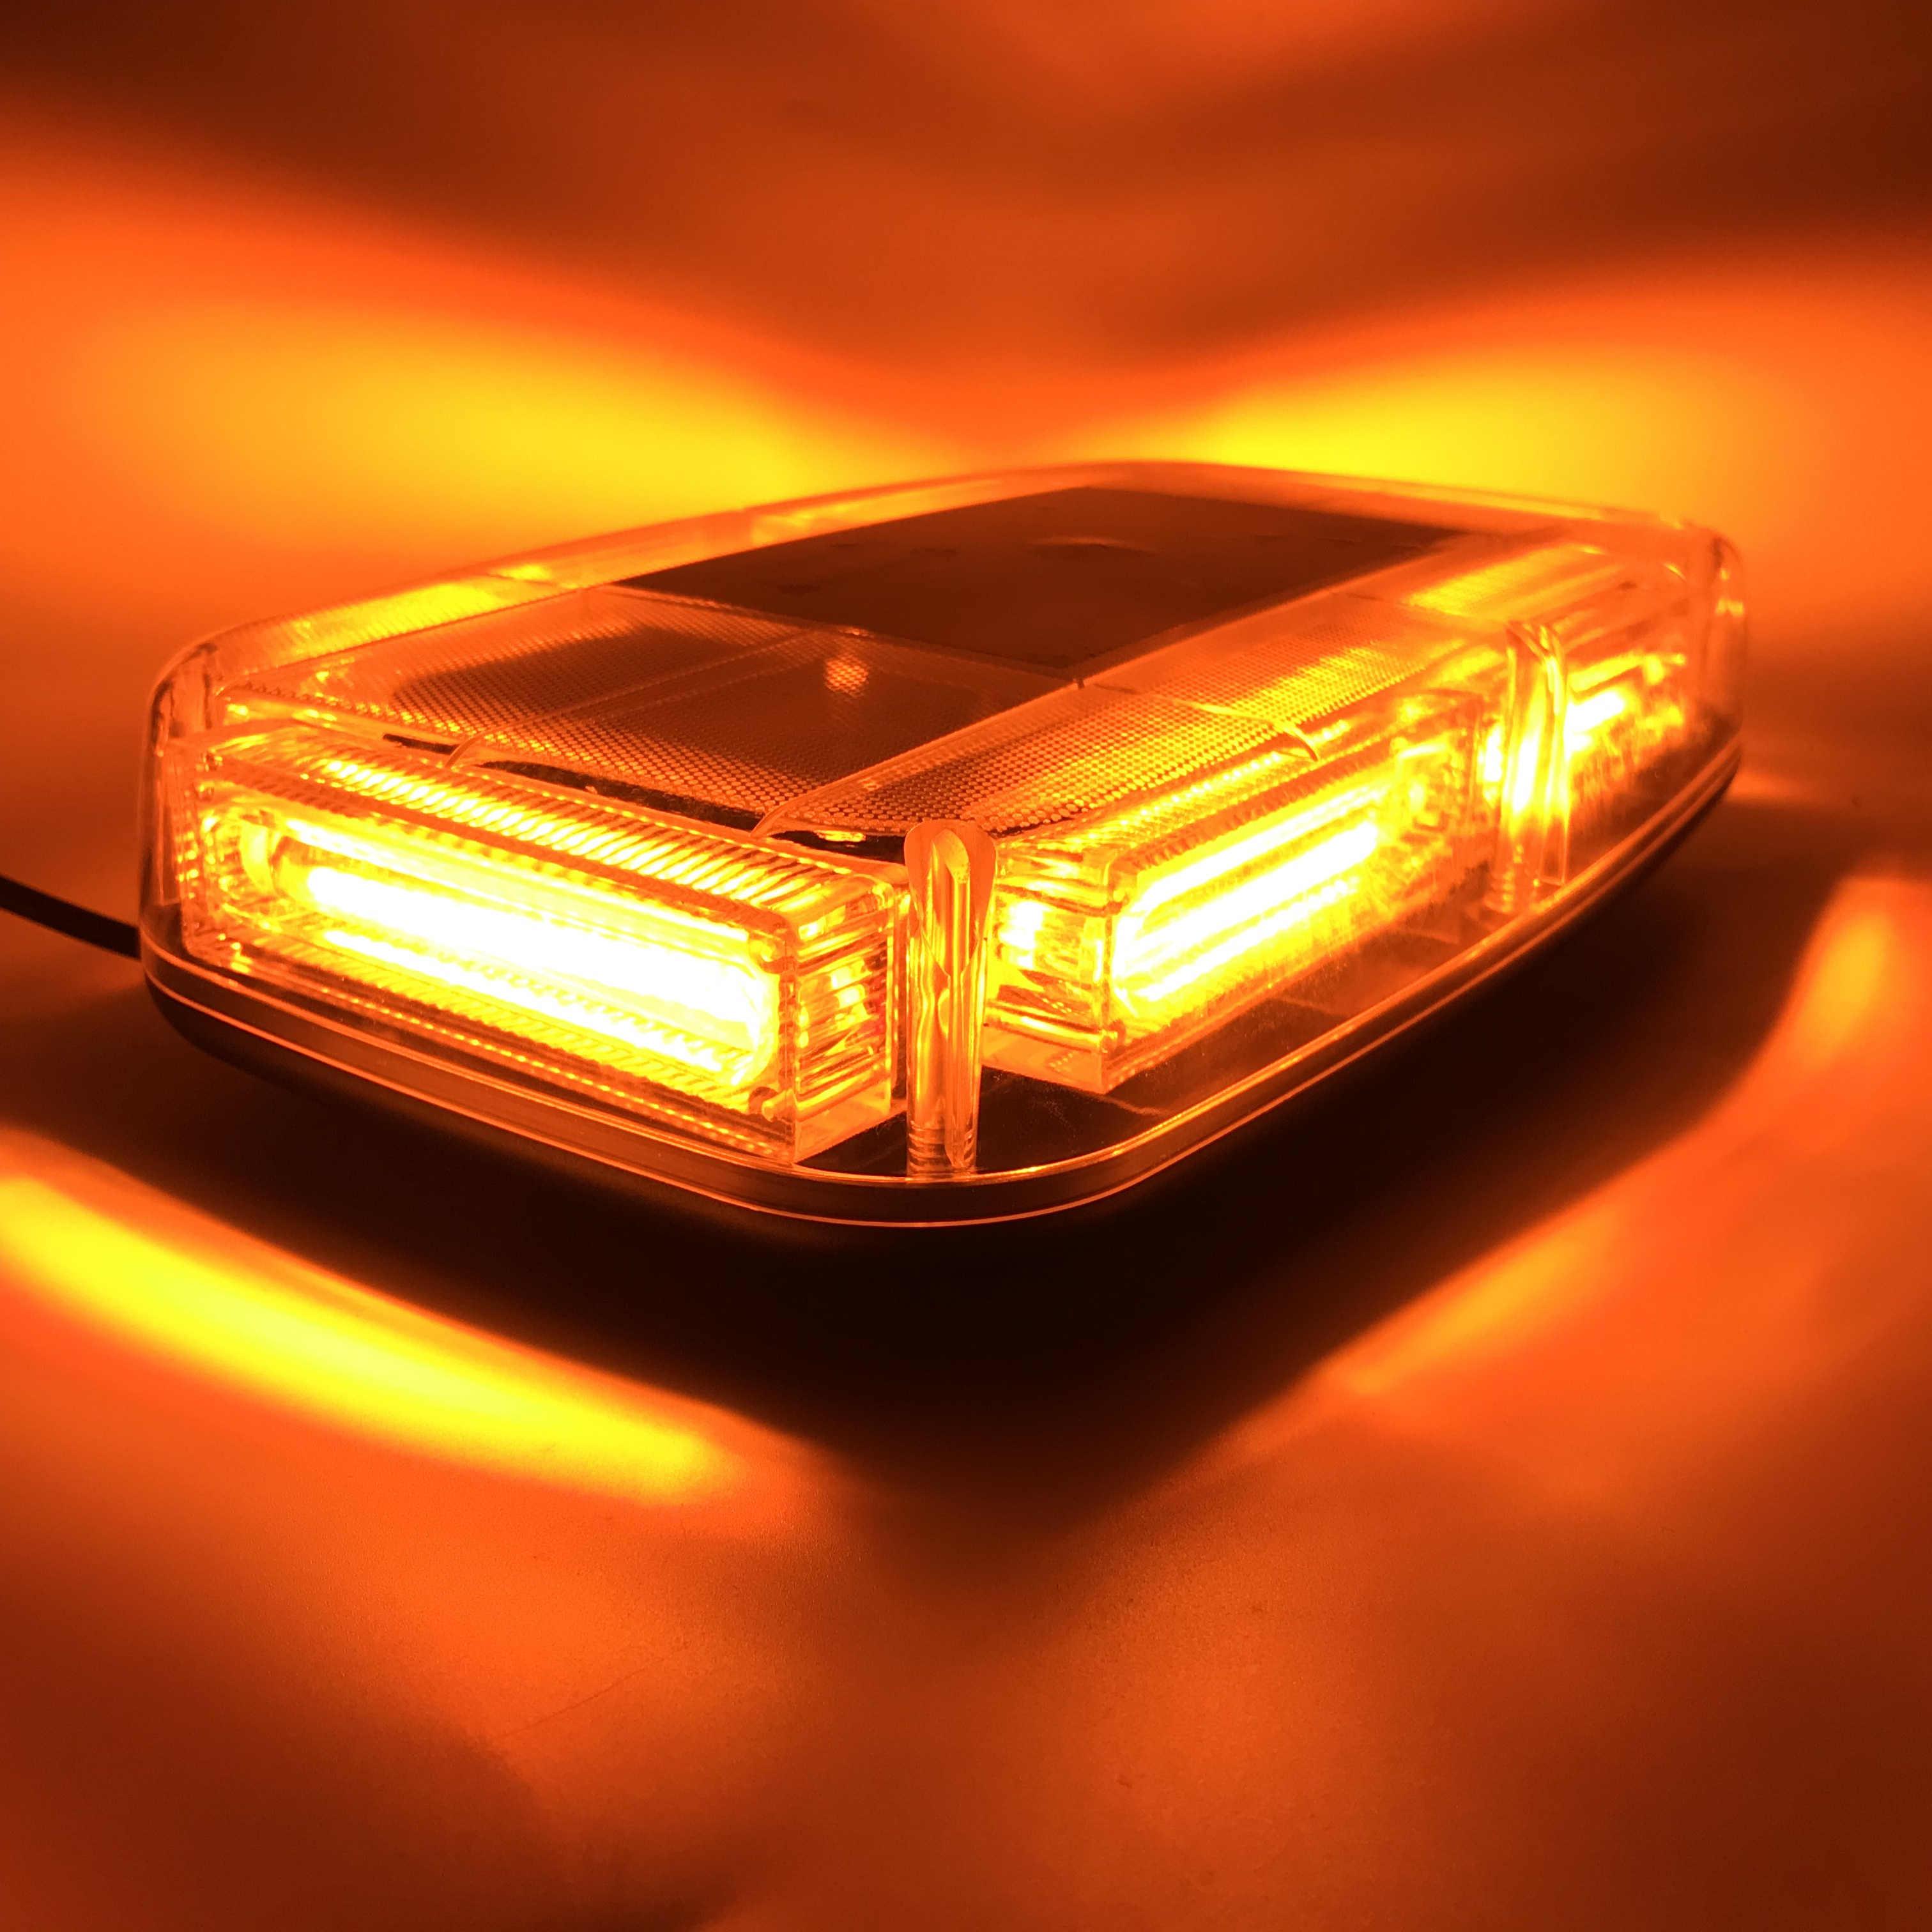 Trucks COB LED Amber/&white Roof Top Warning Strobe Light Firefighters for 12V Vehicles Burst Series Emergency Hazard Beacon Lights Bar w//Magnetic Base Snow Plow Police